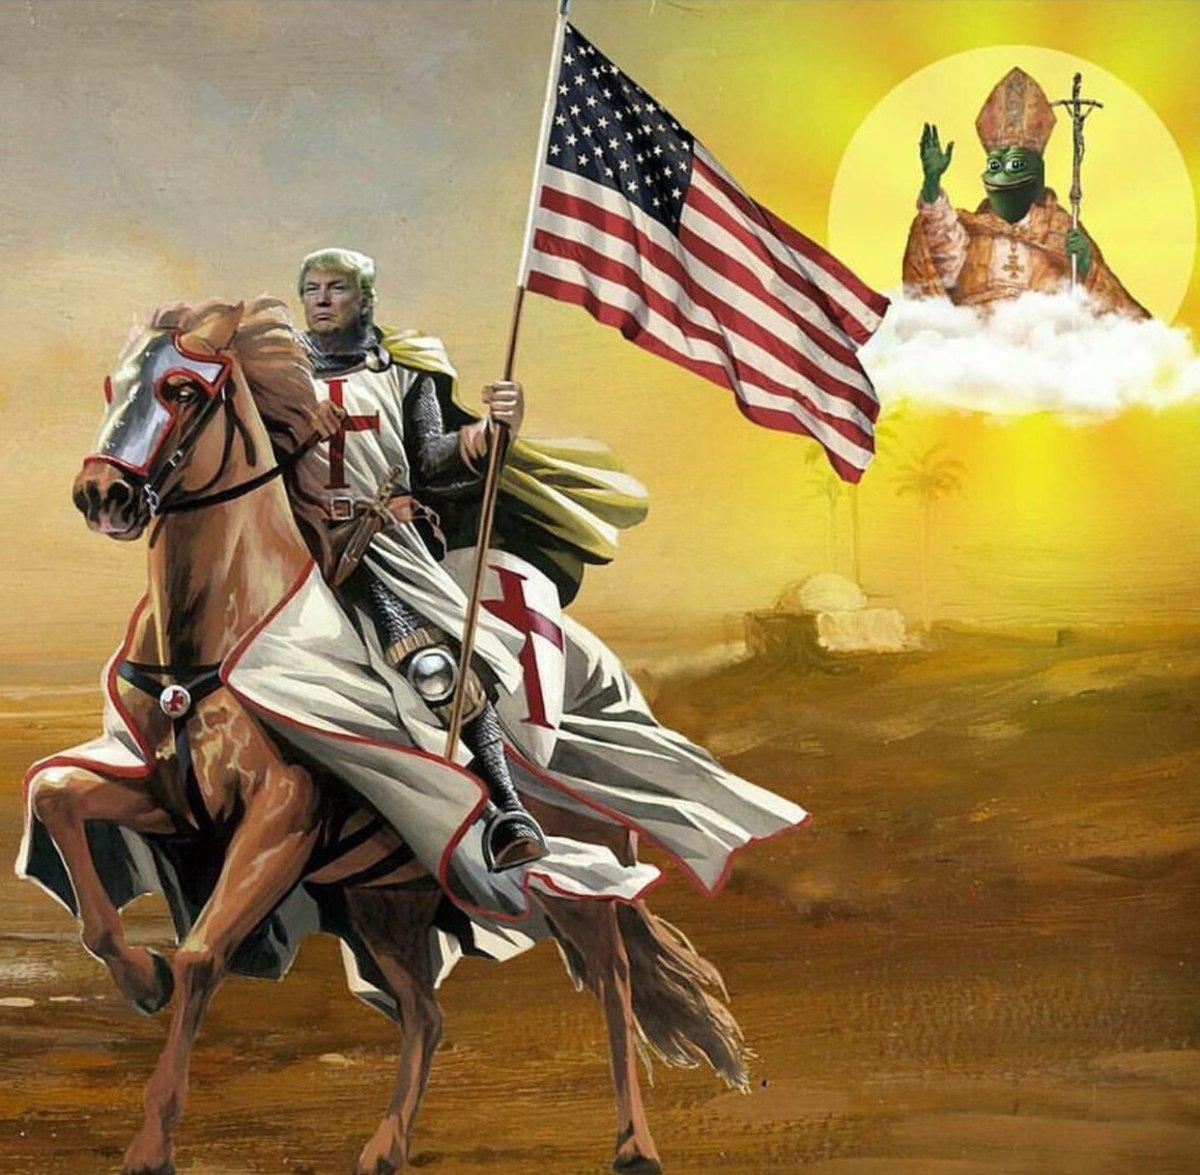 pope pepe and the donald knight.jpeg